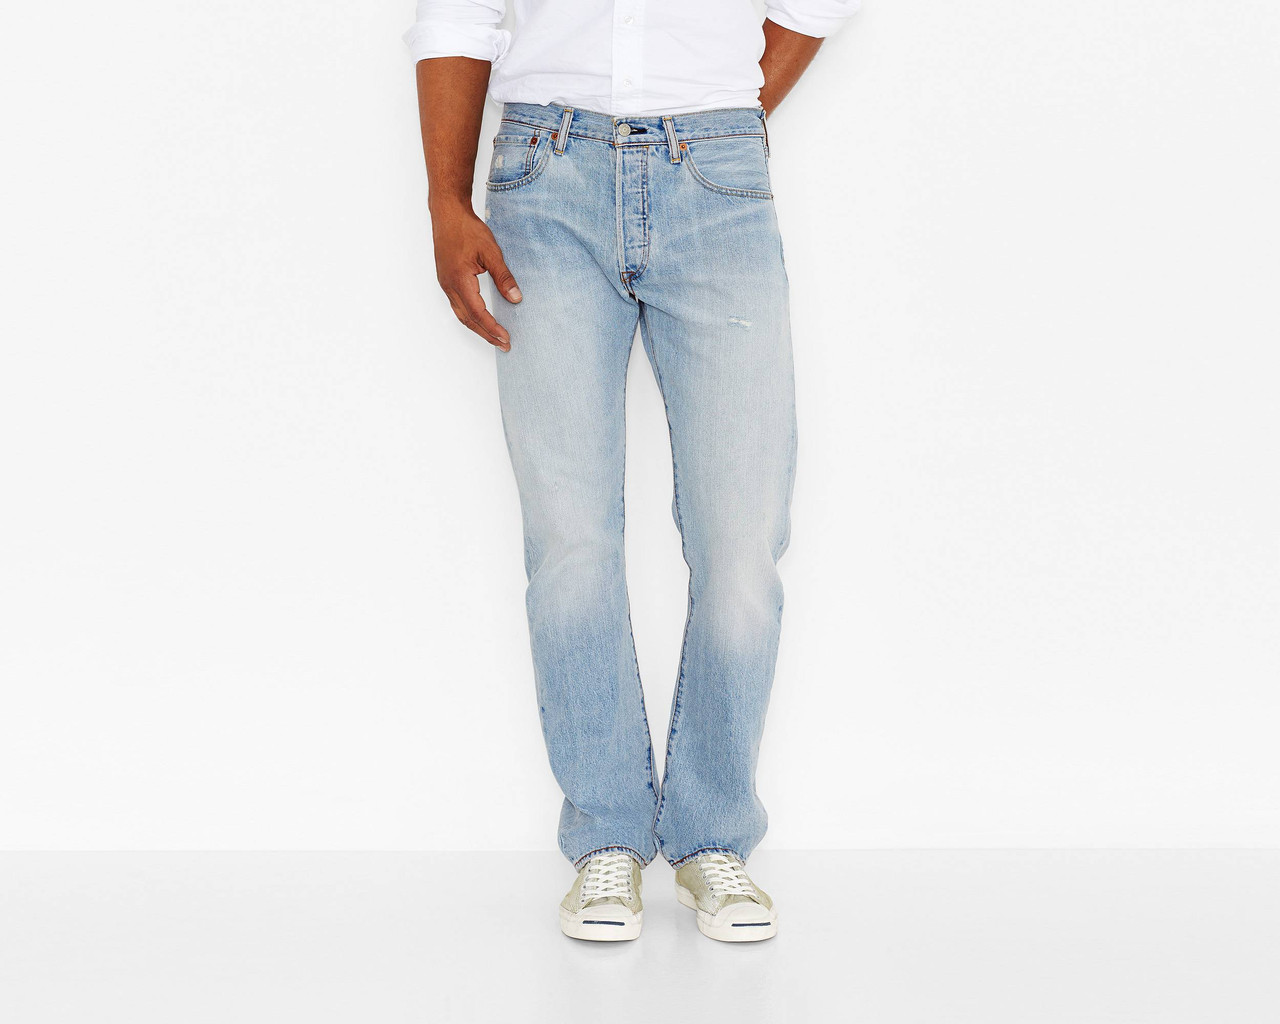 Джинсы Levi's 501 Original Fit, Lincoln Park, 36W30L, 005012045